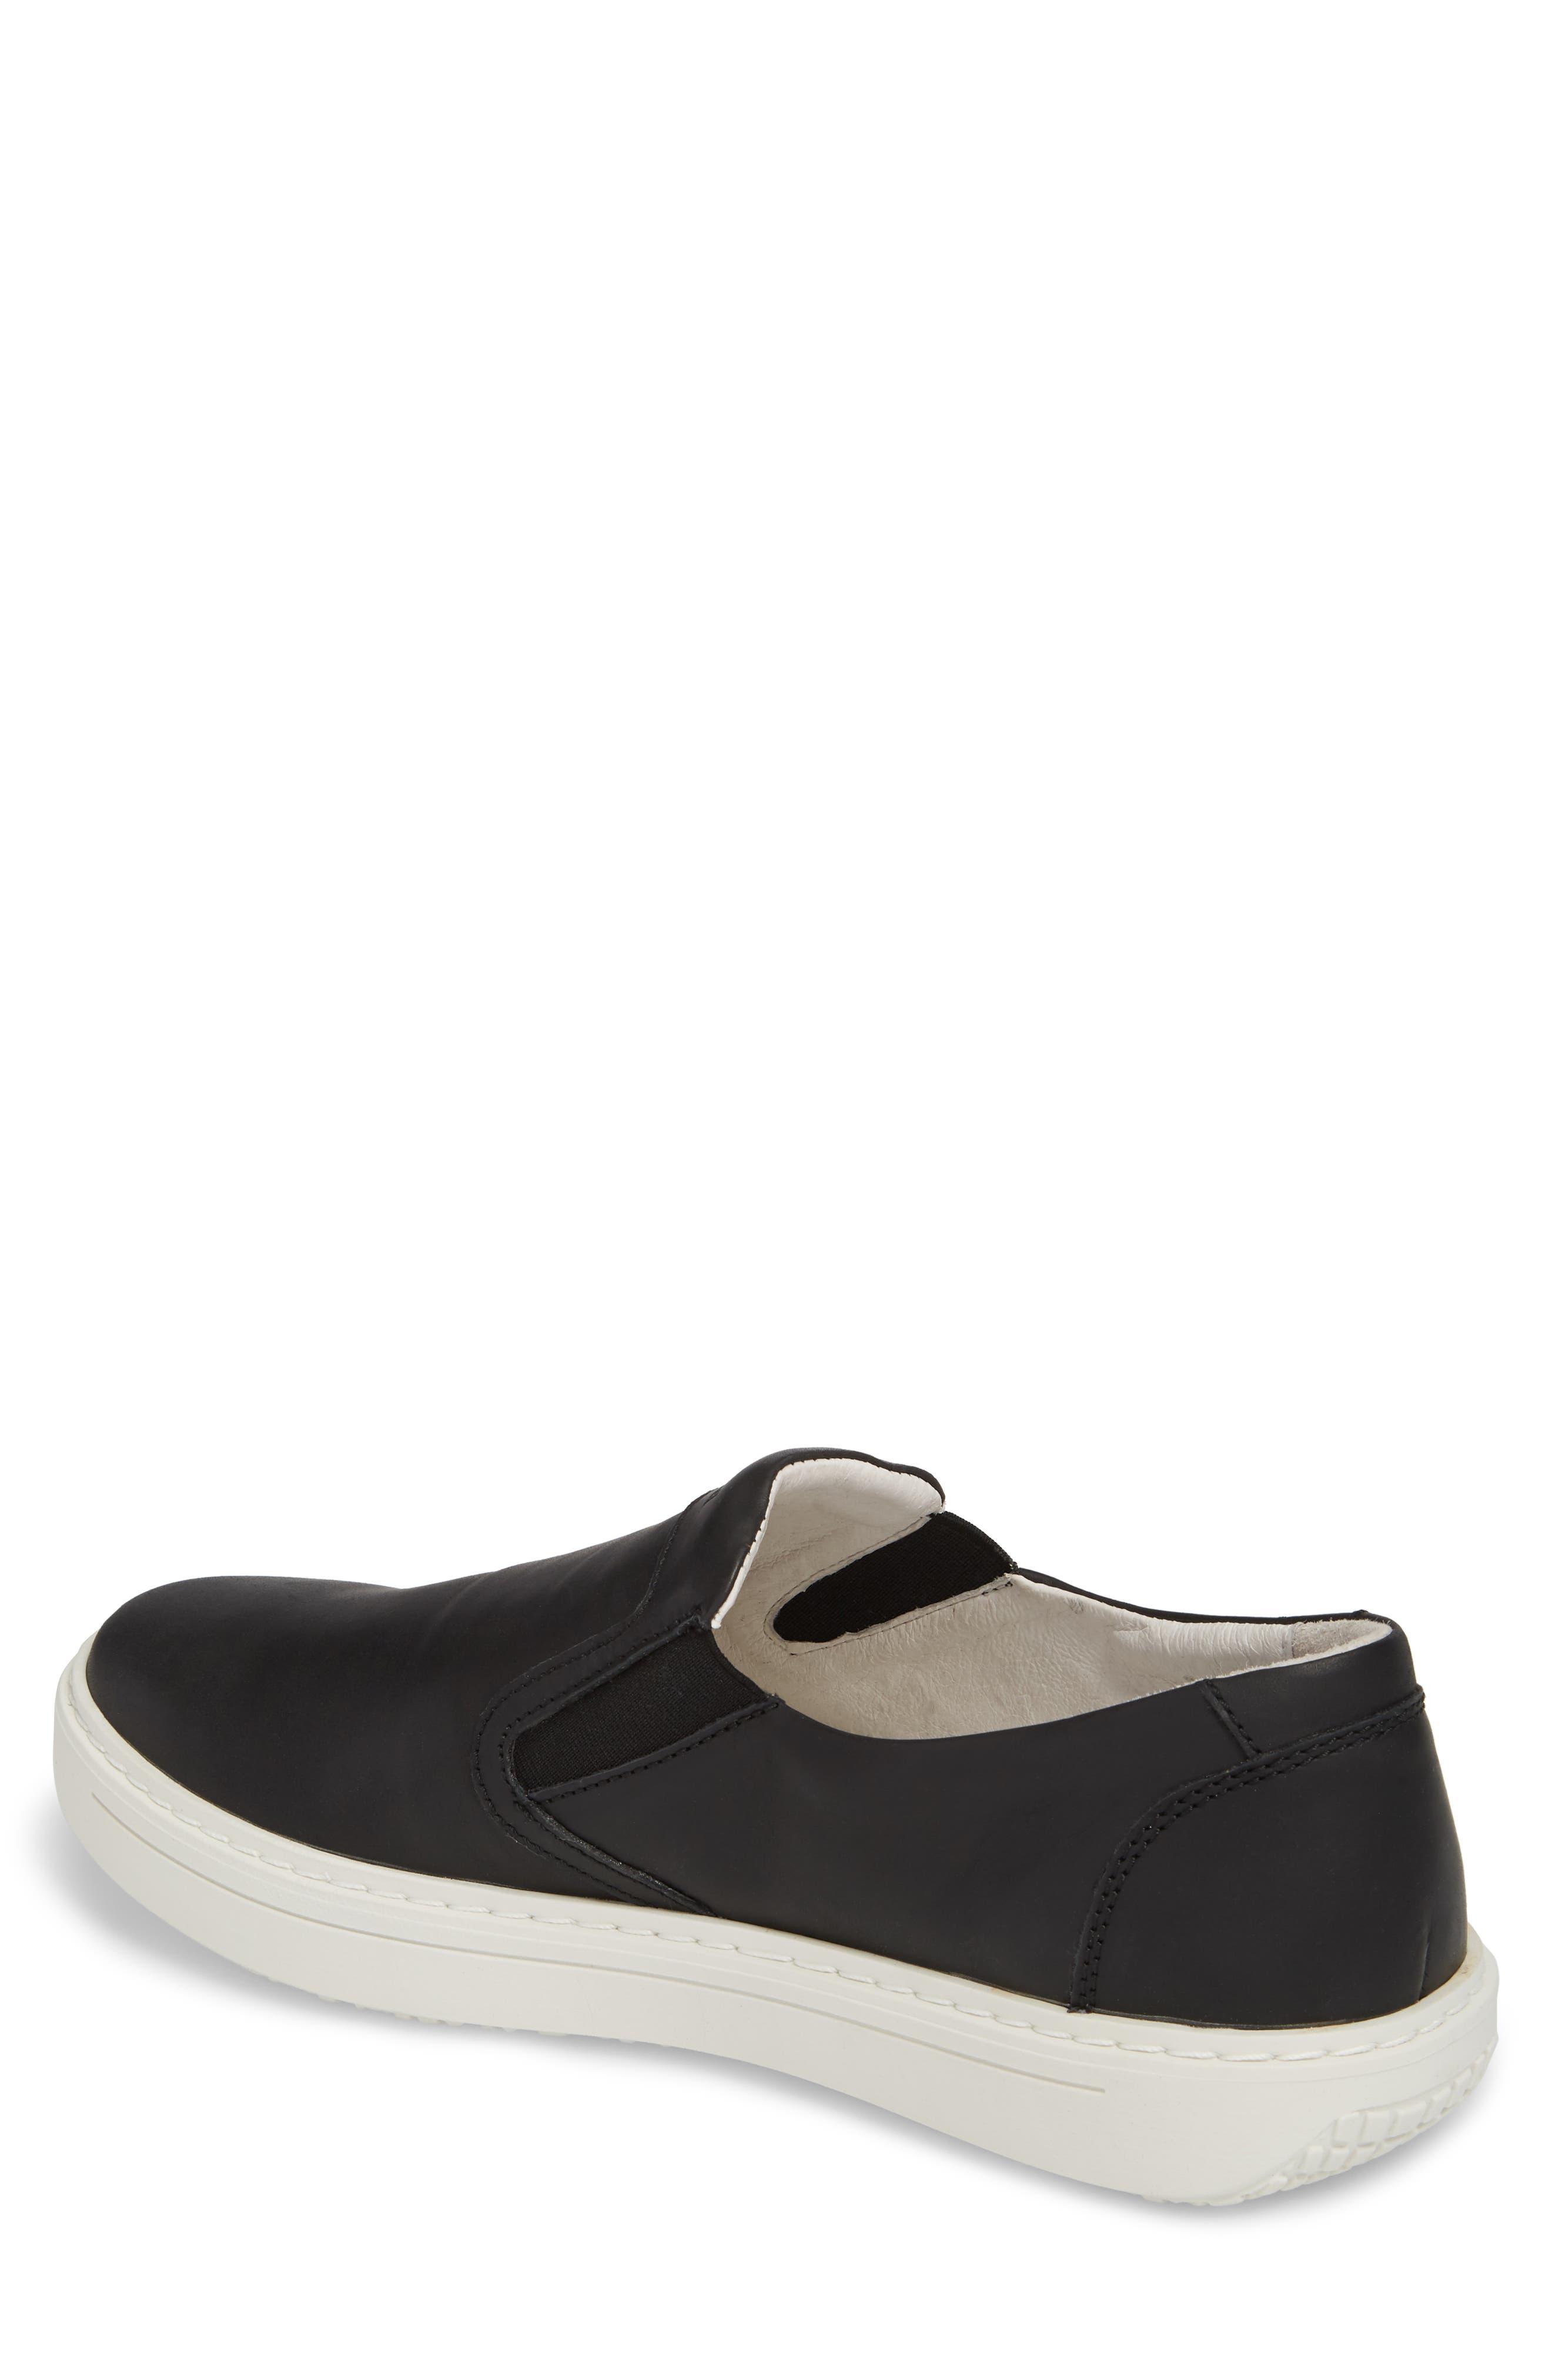 Quentin 15 Slip-On Sneaker,                             Alternate thumbnail 2, color,                             BLACK LEATHER